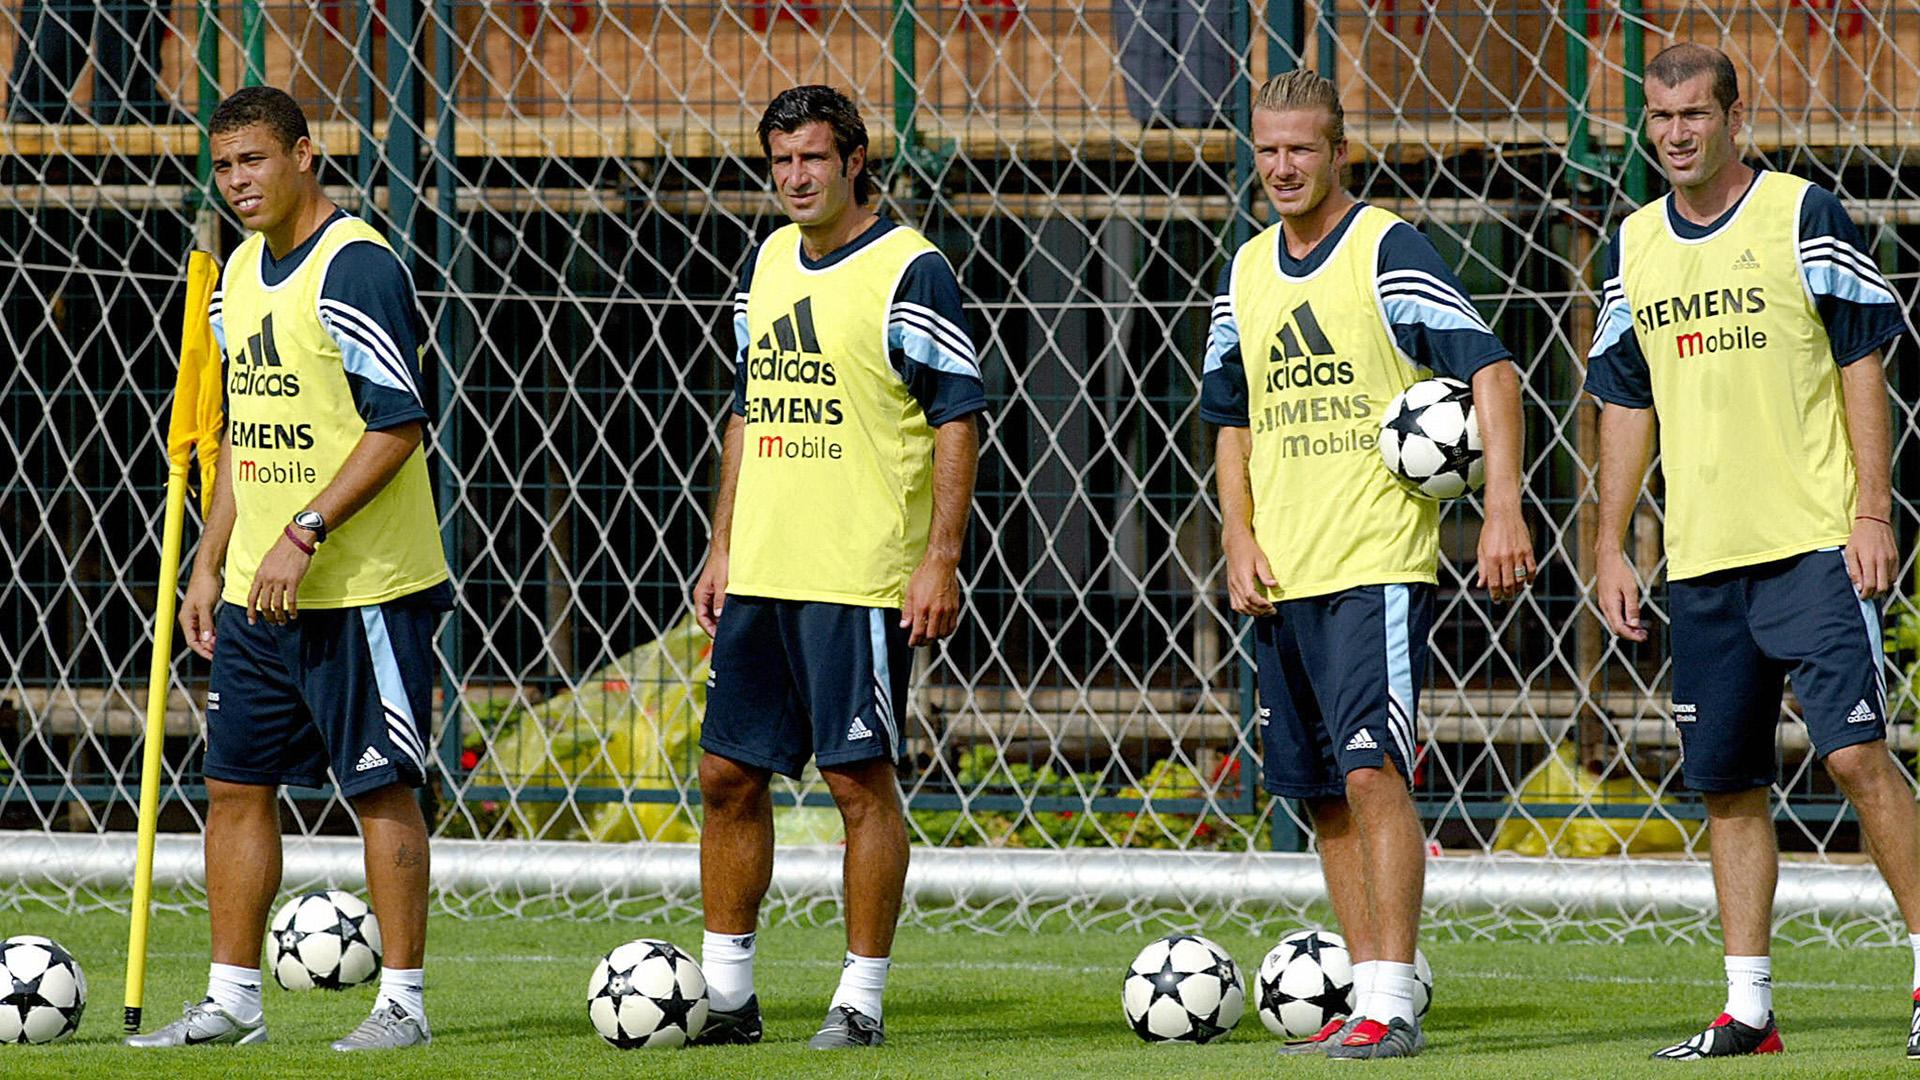 Ronaldo Luis Figo David Beckham Zinedine Zidane Real Madrid